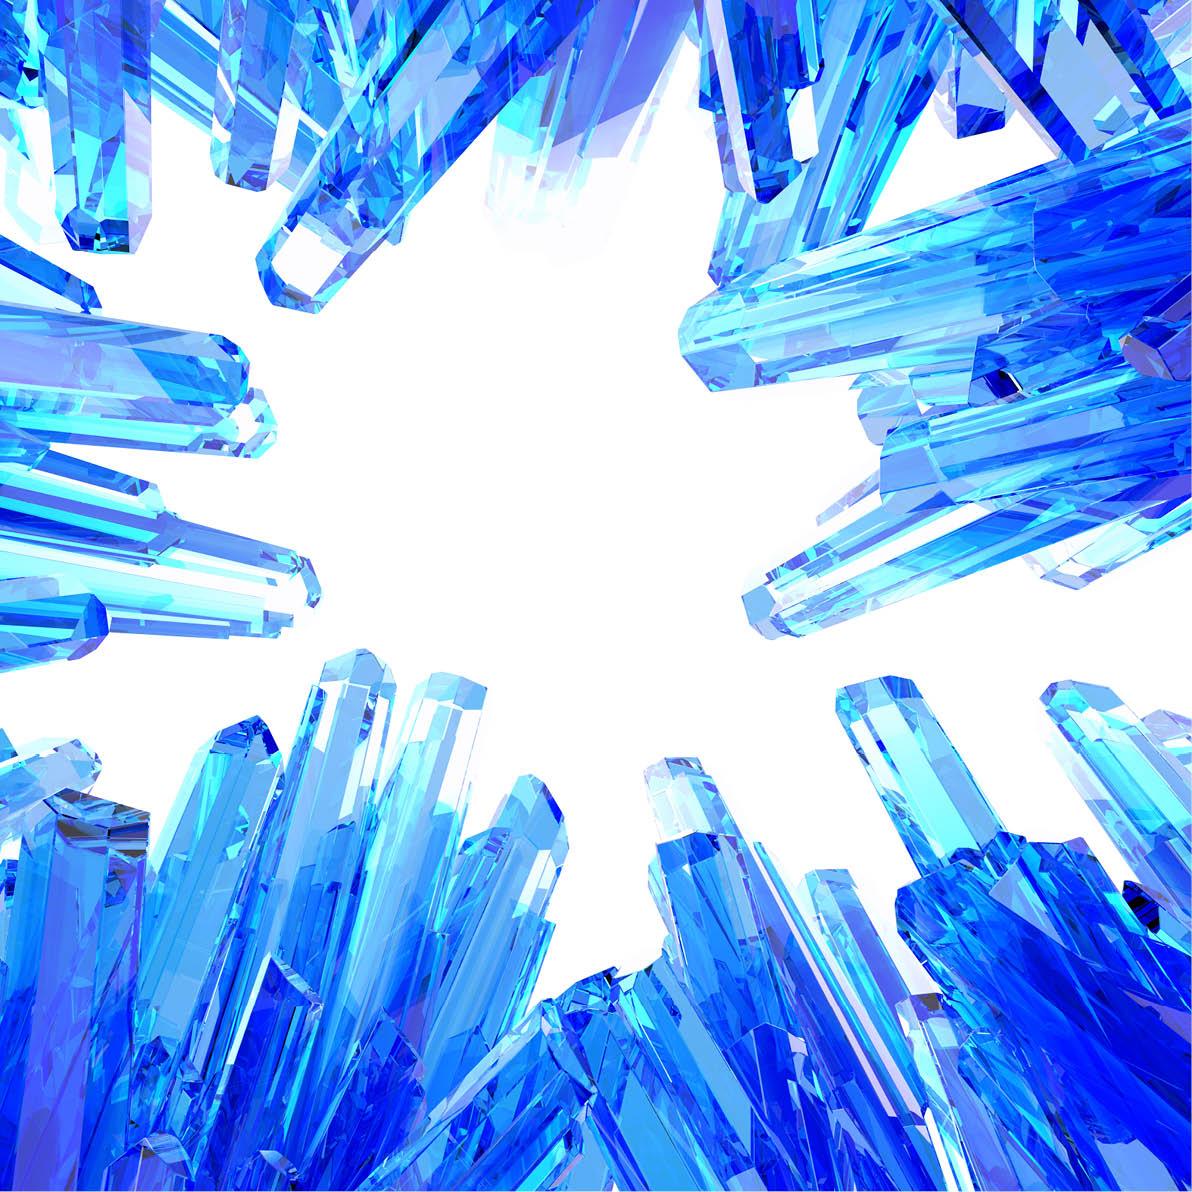 crystals close up